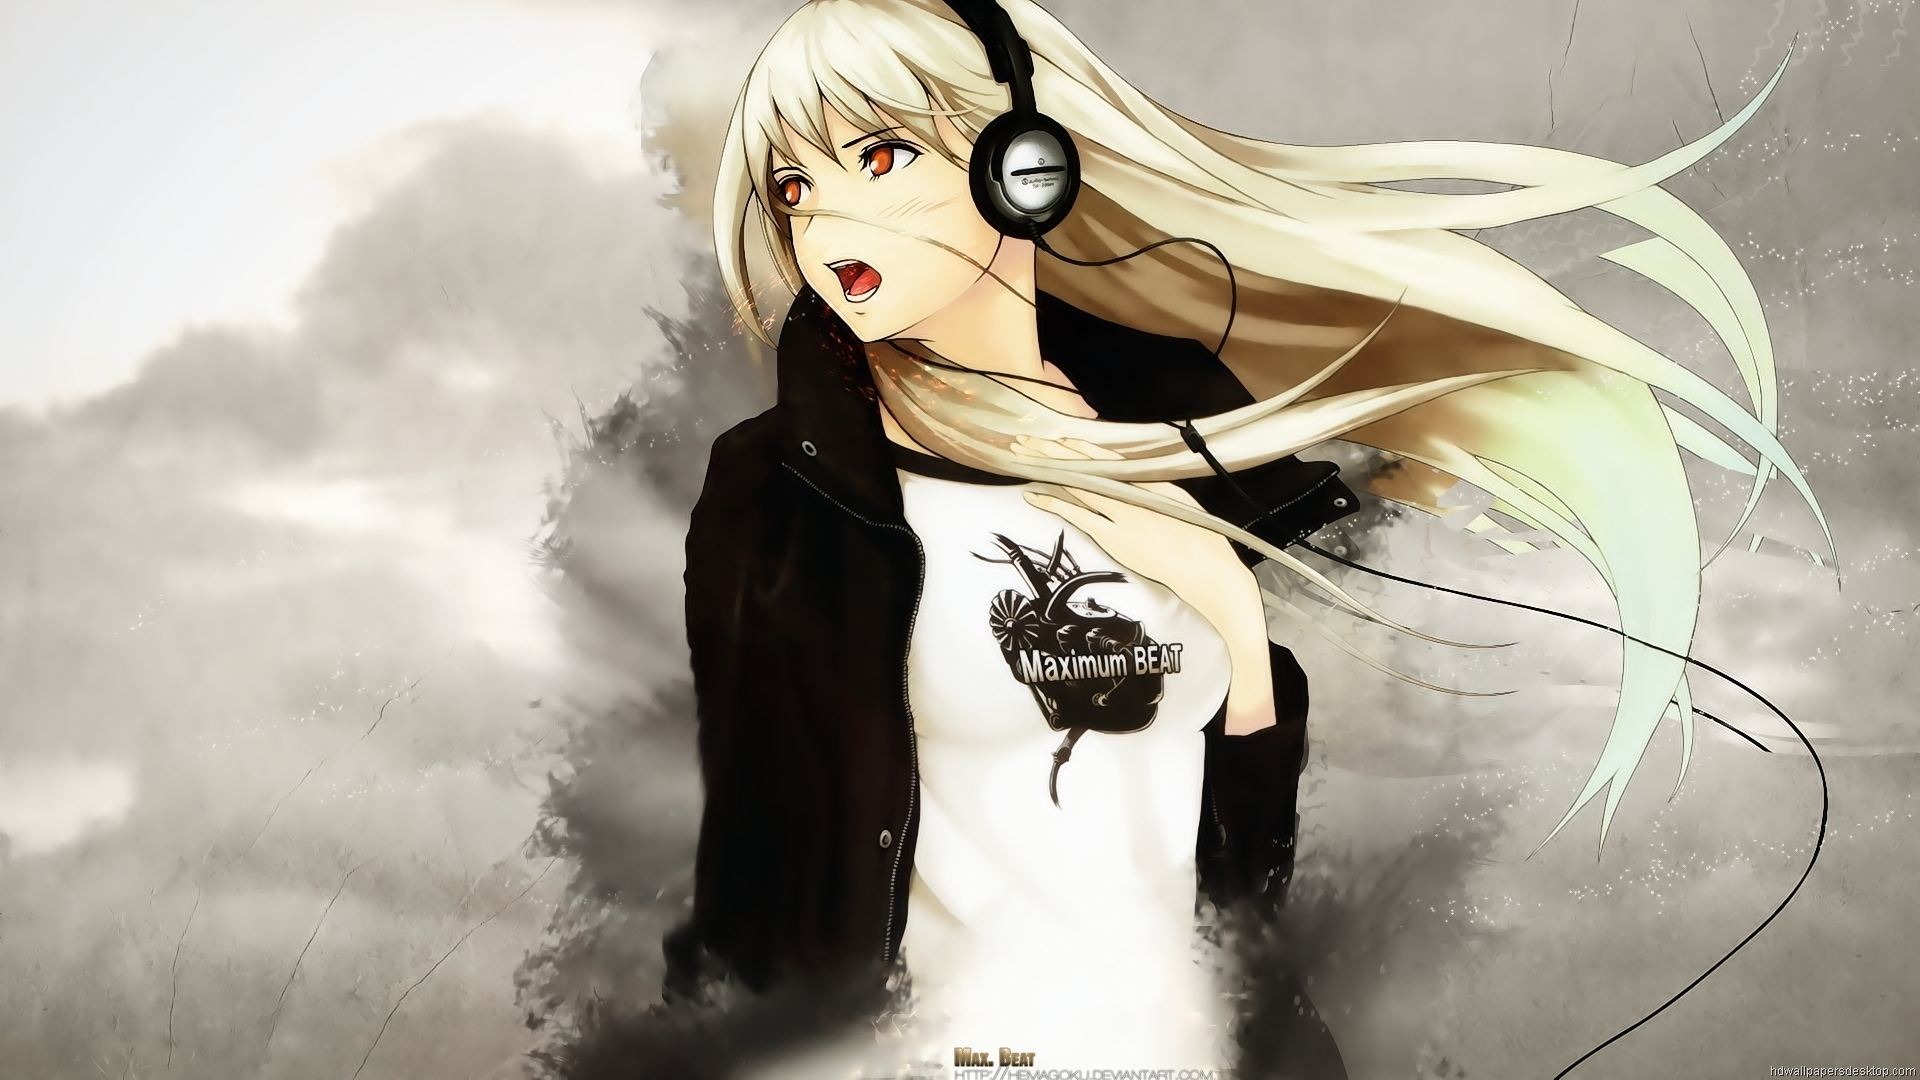 Download Anime Manga Girls Art Wallpaper X Full Hd